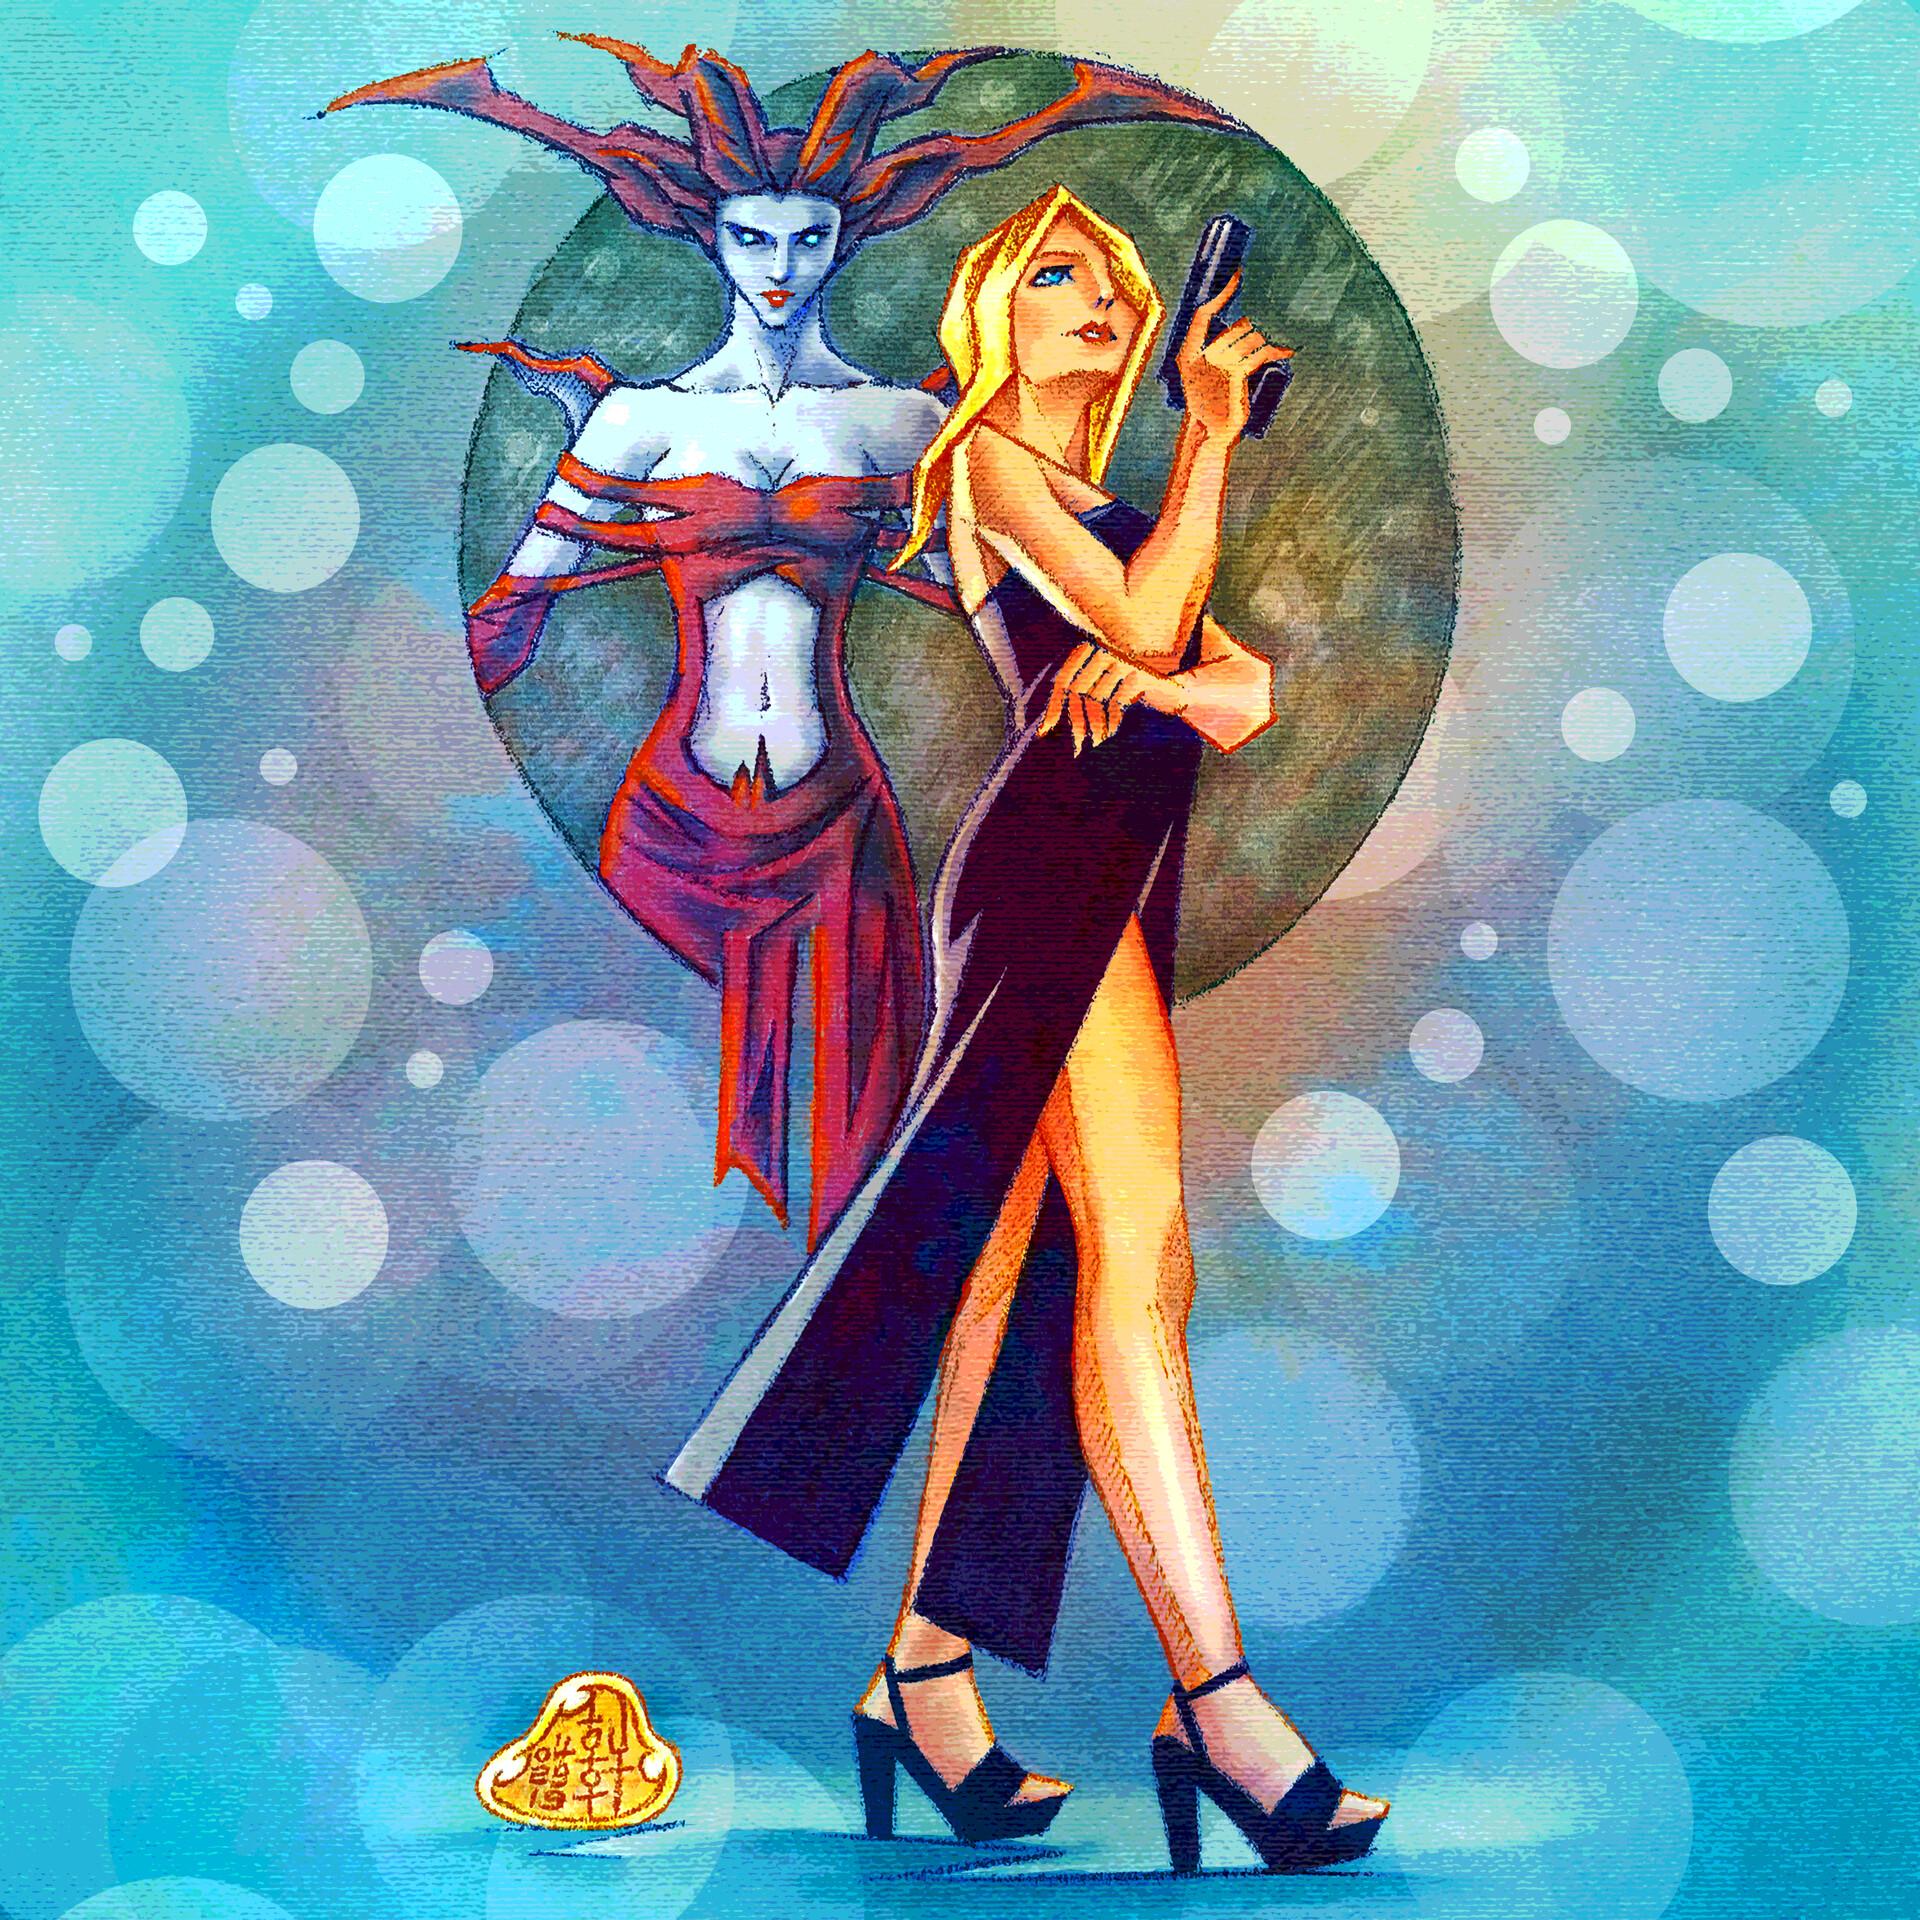 Aya and Eve - Version II